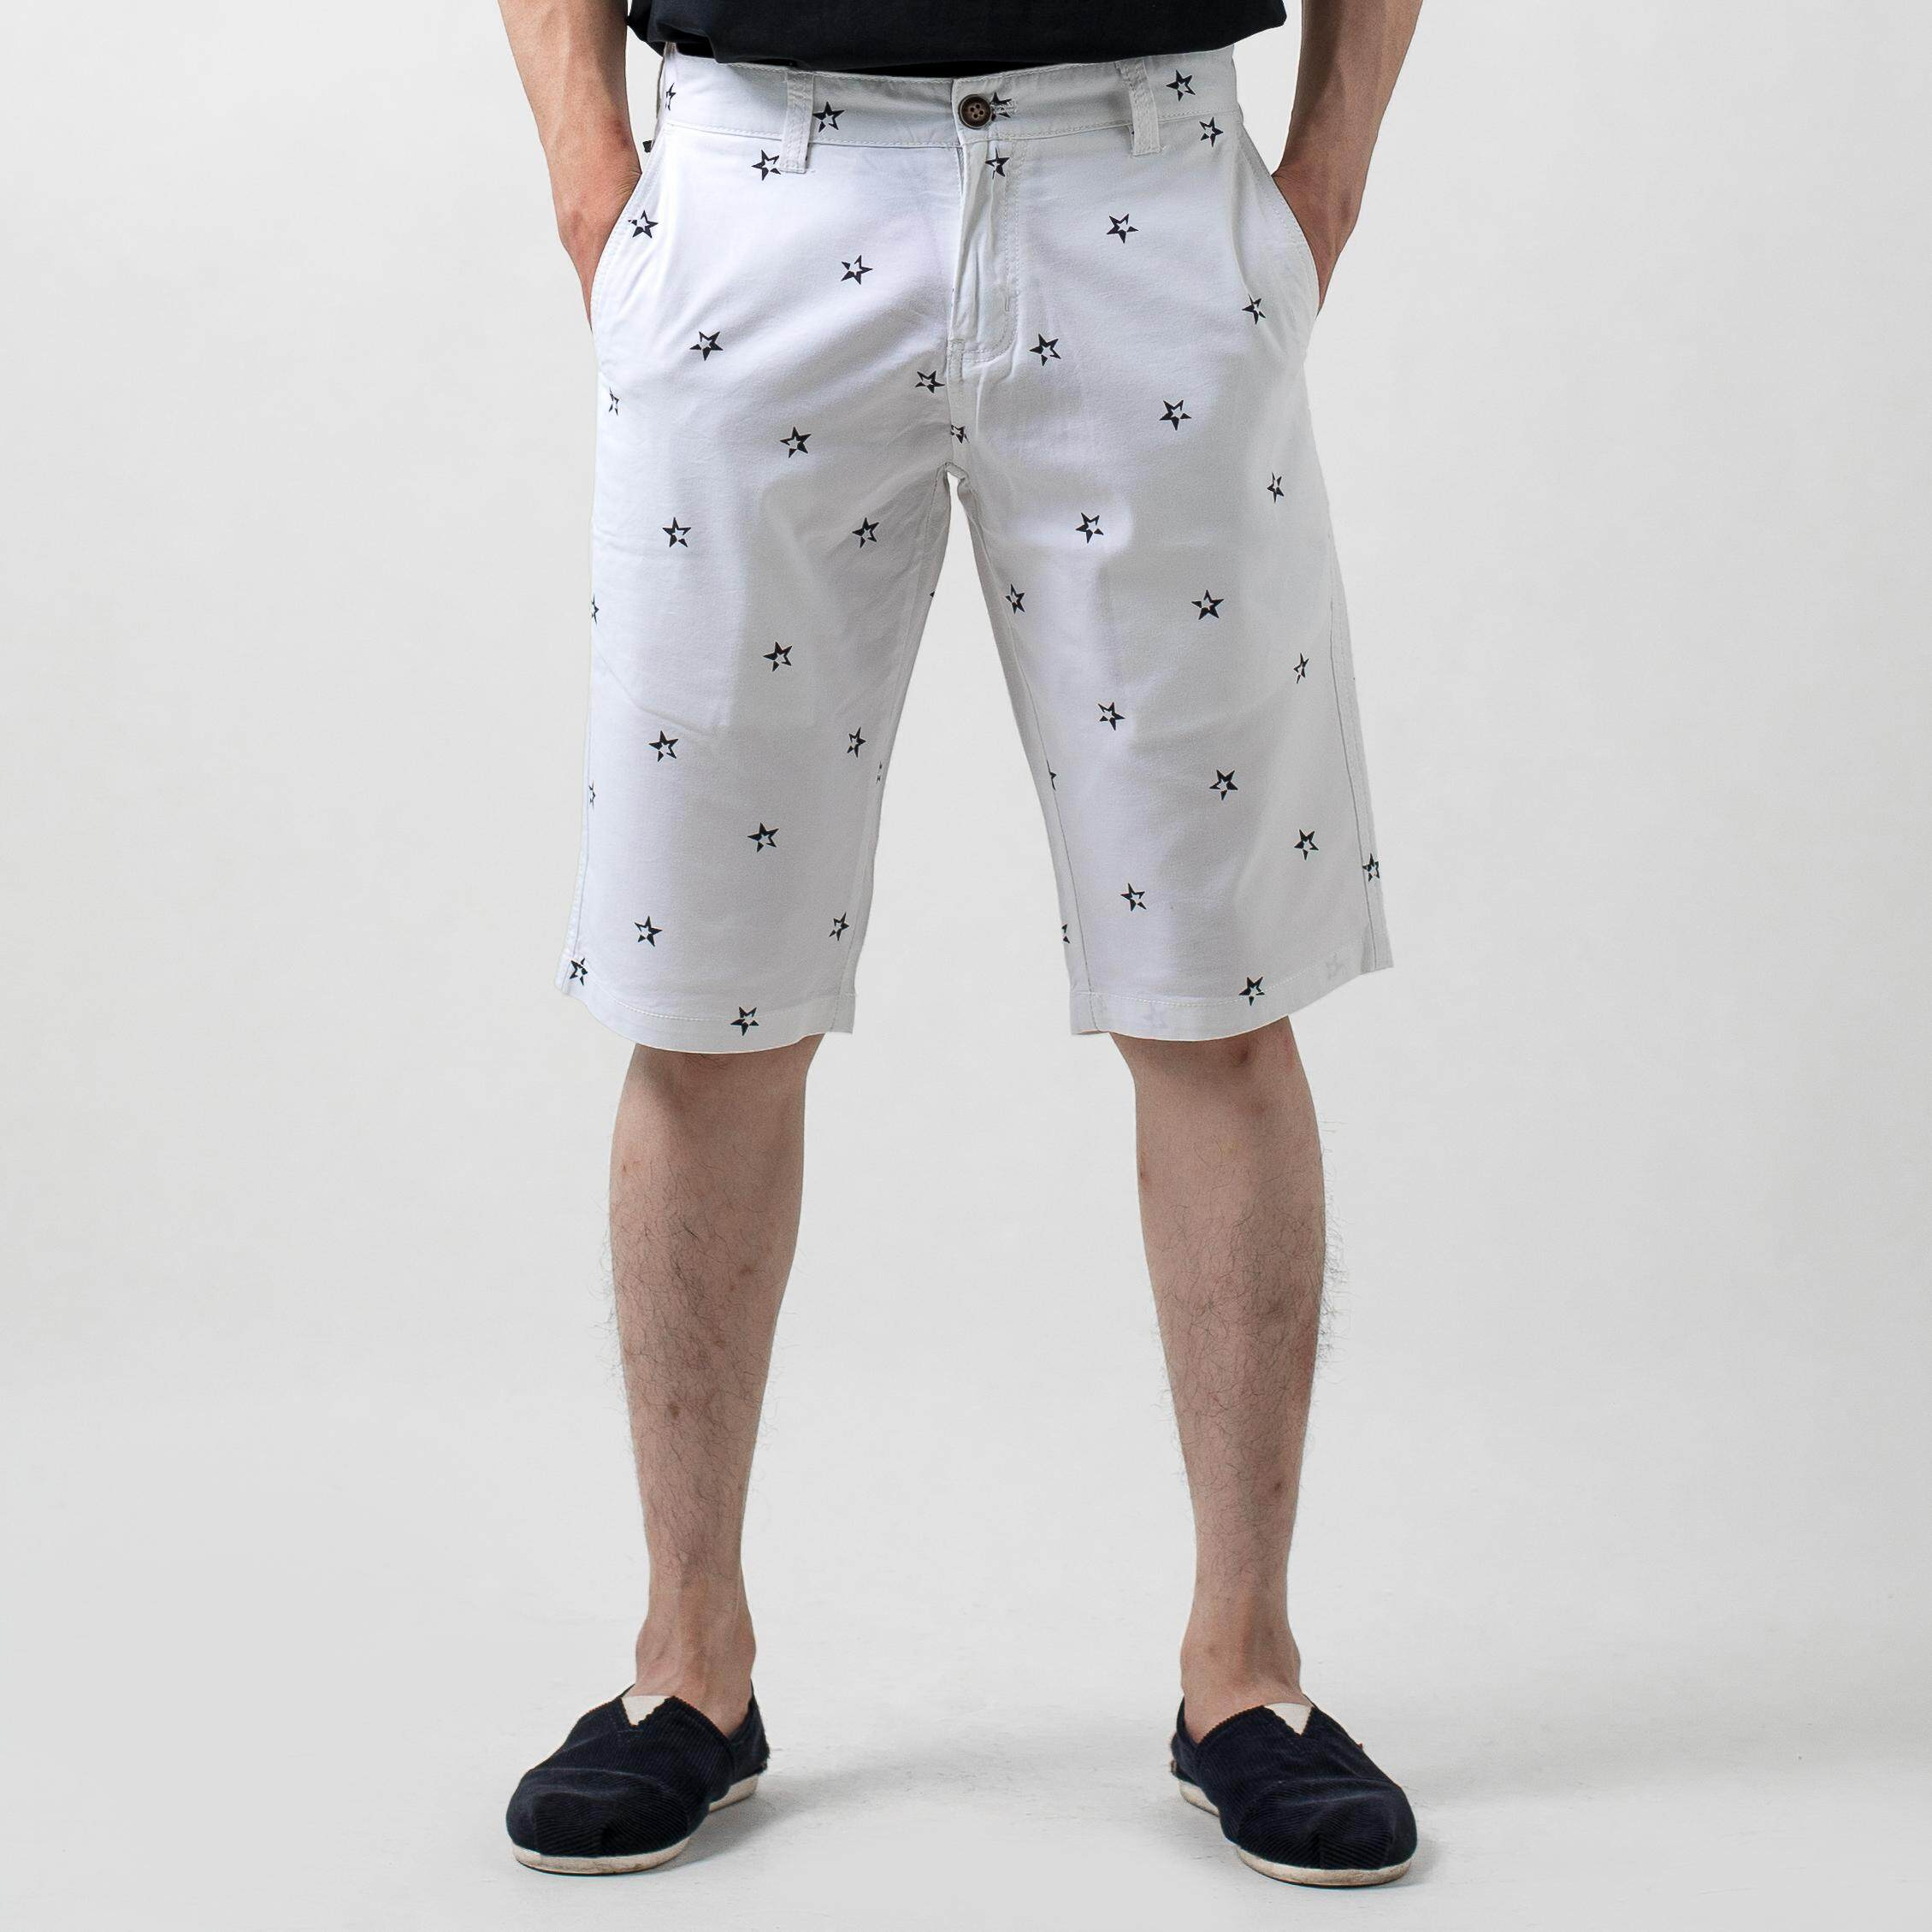 MEN'S CHINO SHORT PANTS WITH STAR PRINTING B49-50482-SF#1